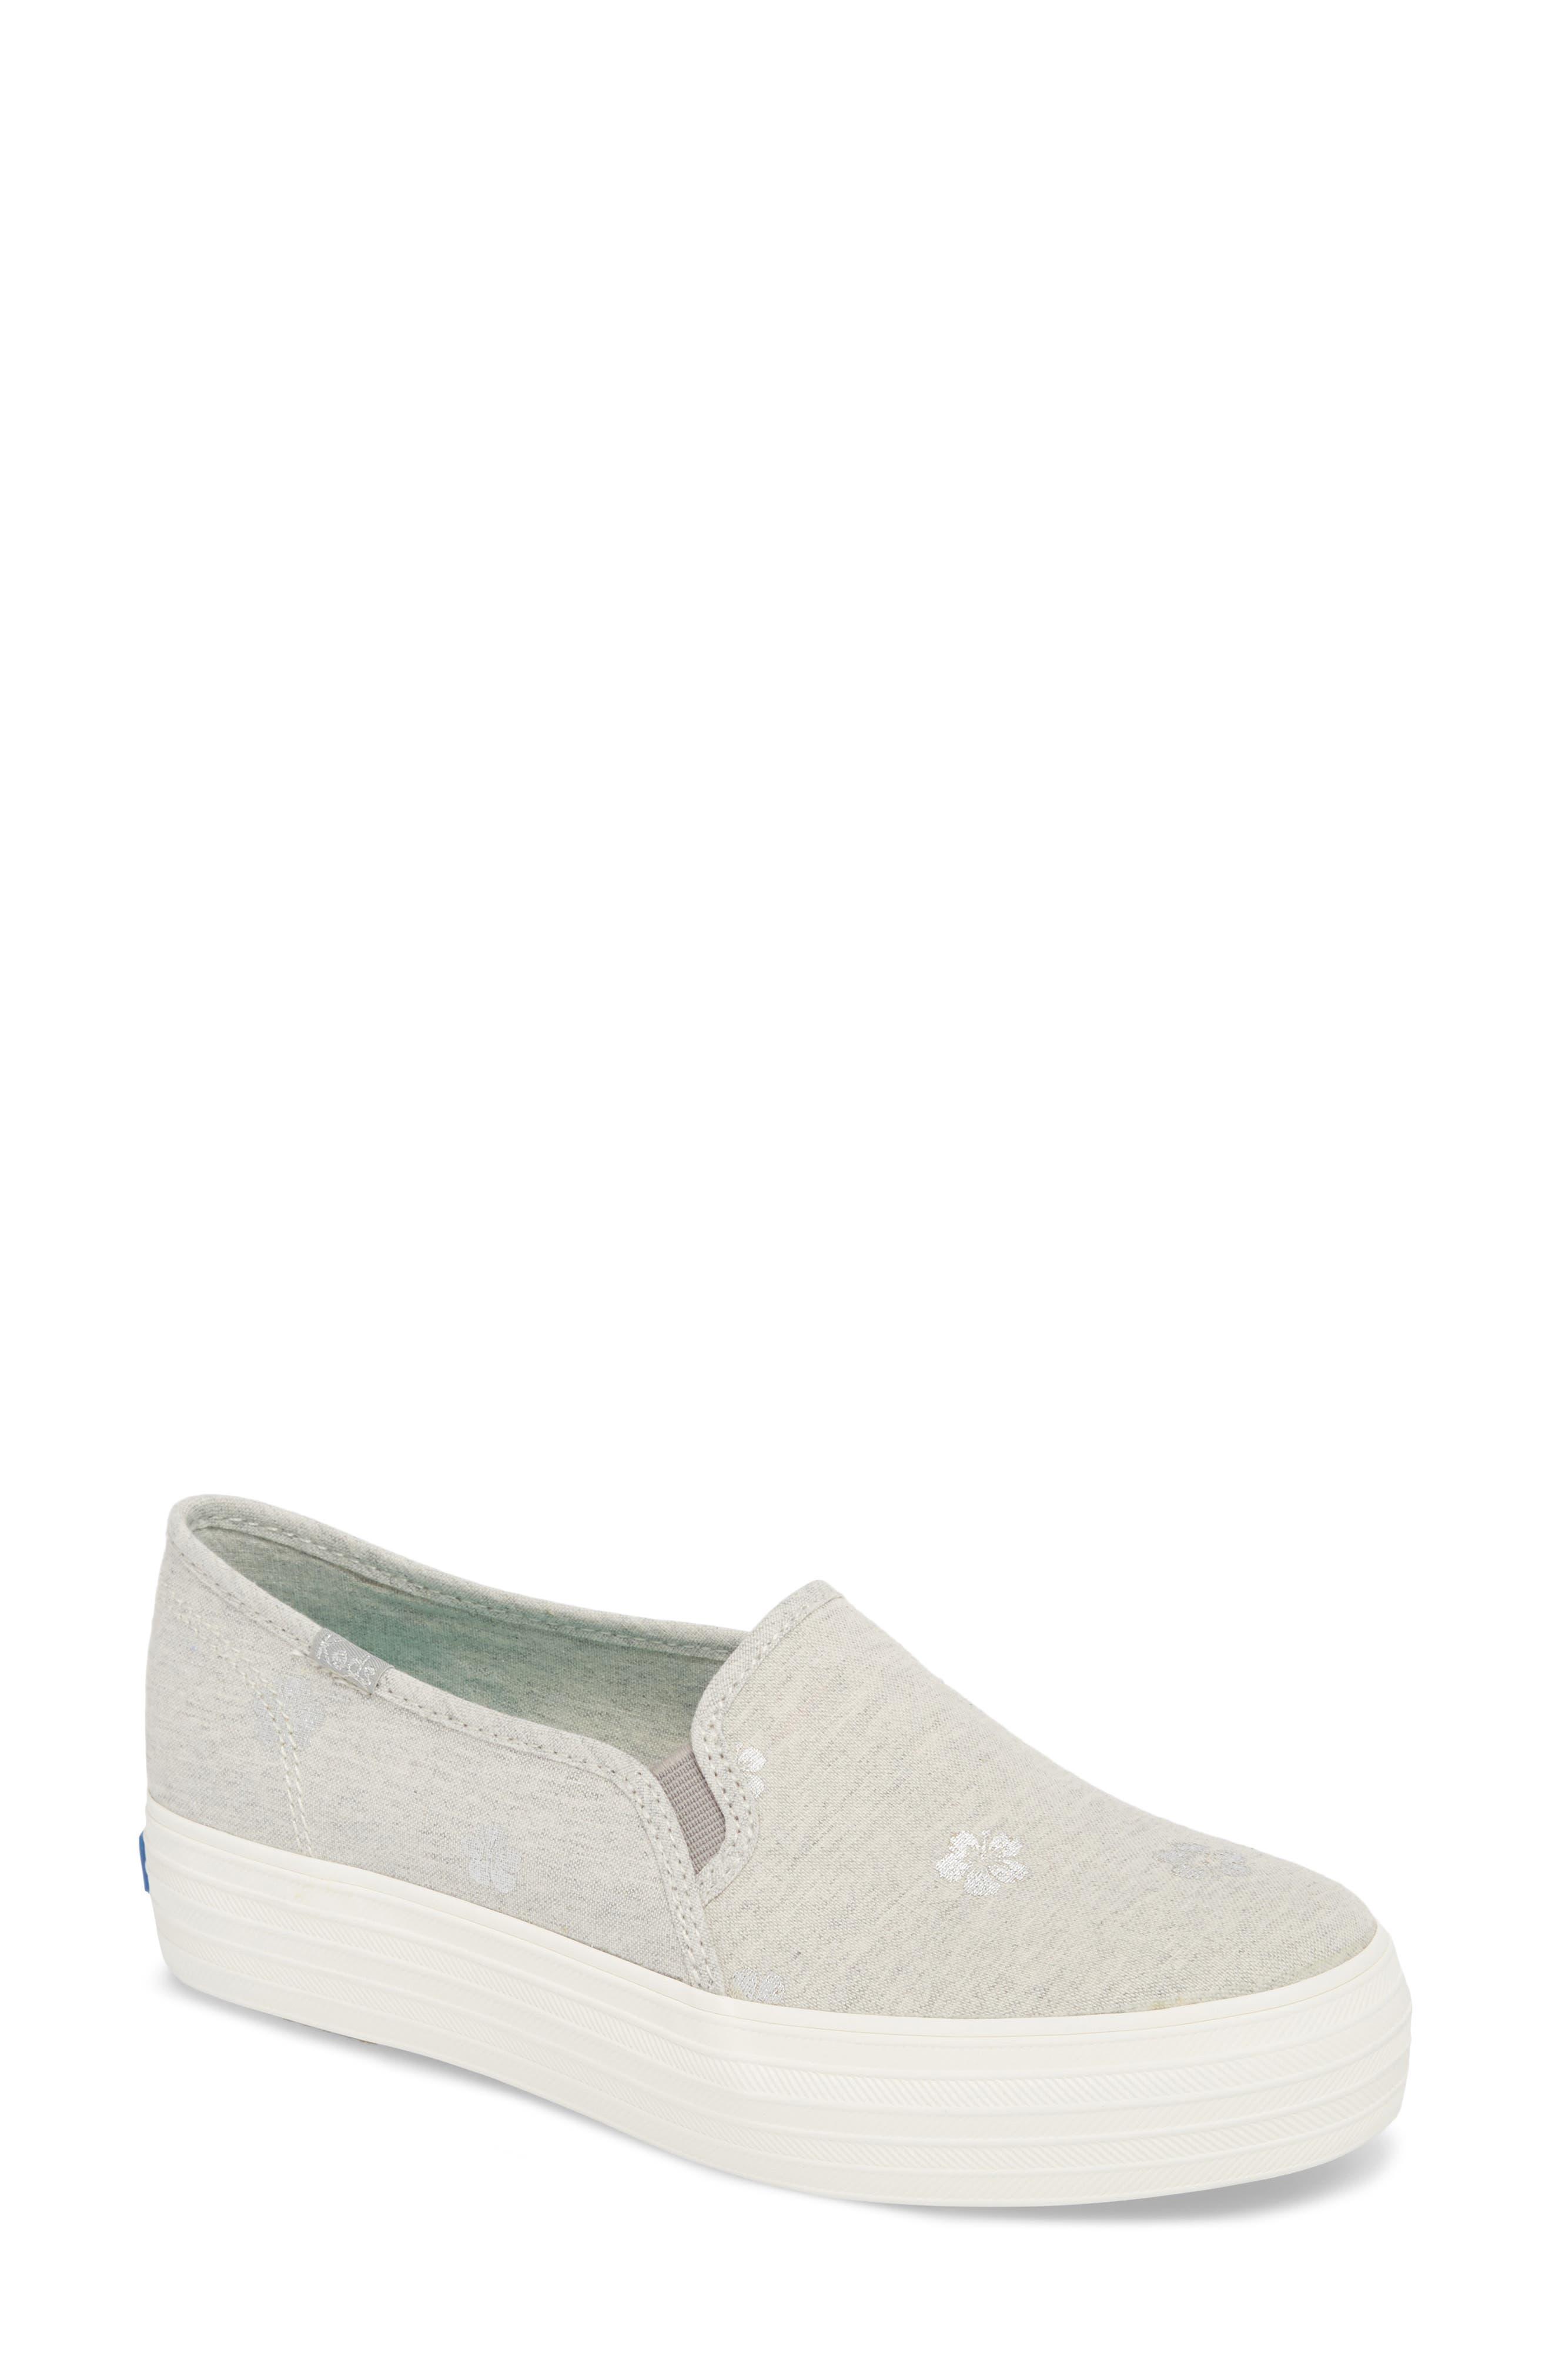 Triple Decker Hibiscus Slip-On Platform Sneaker,                         Main,                         color, Light Grey